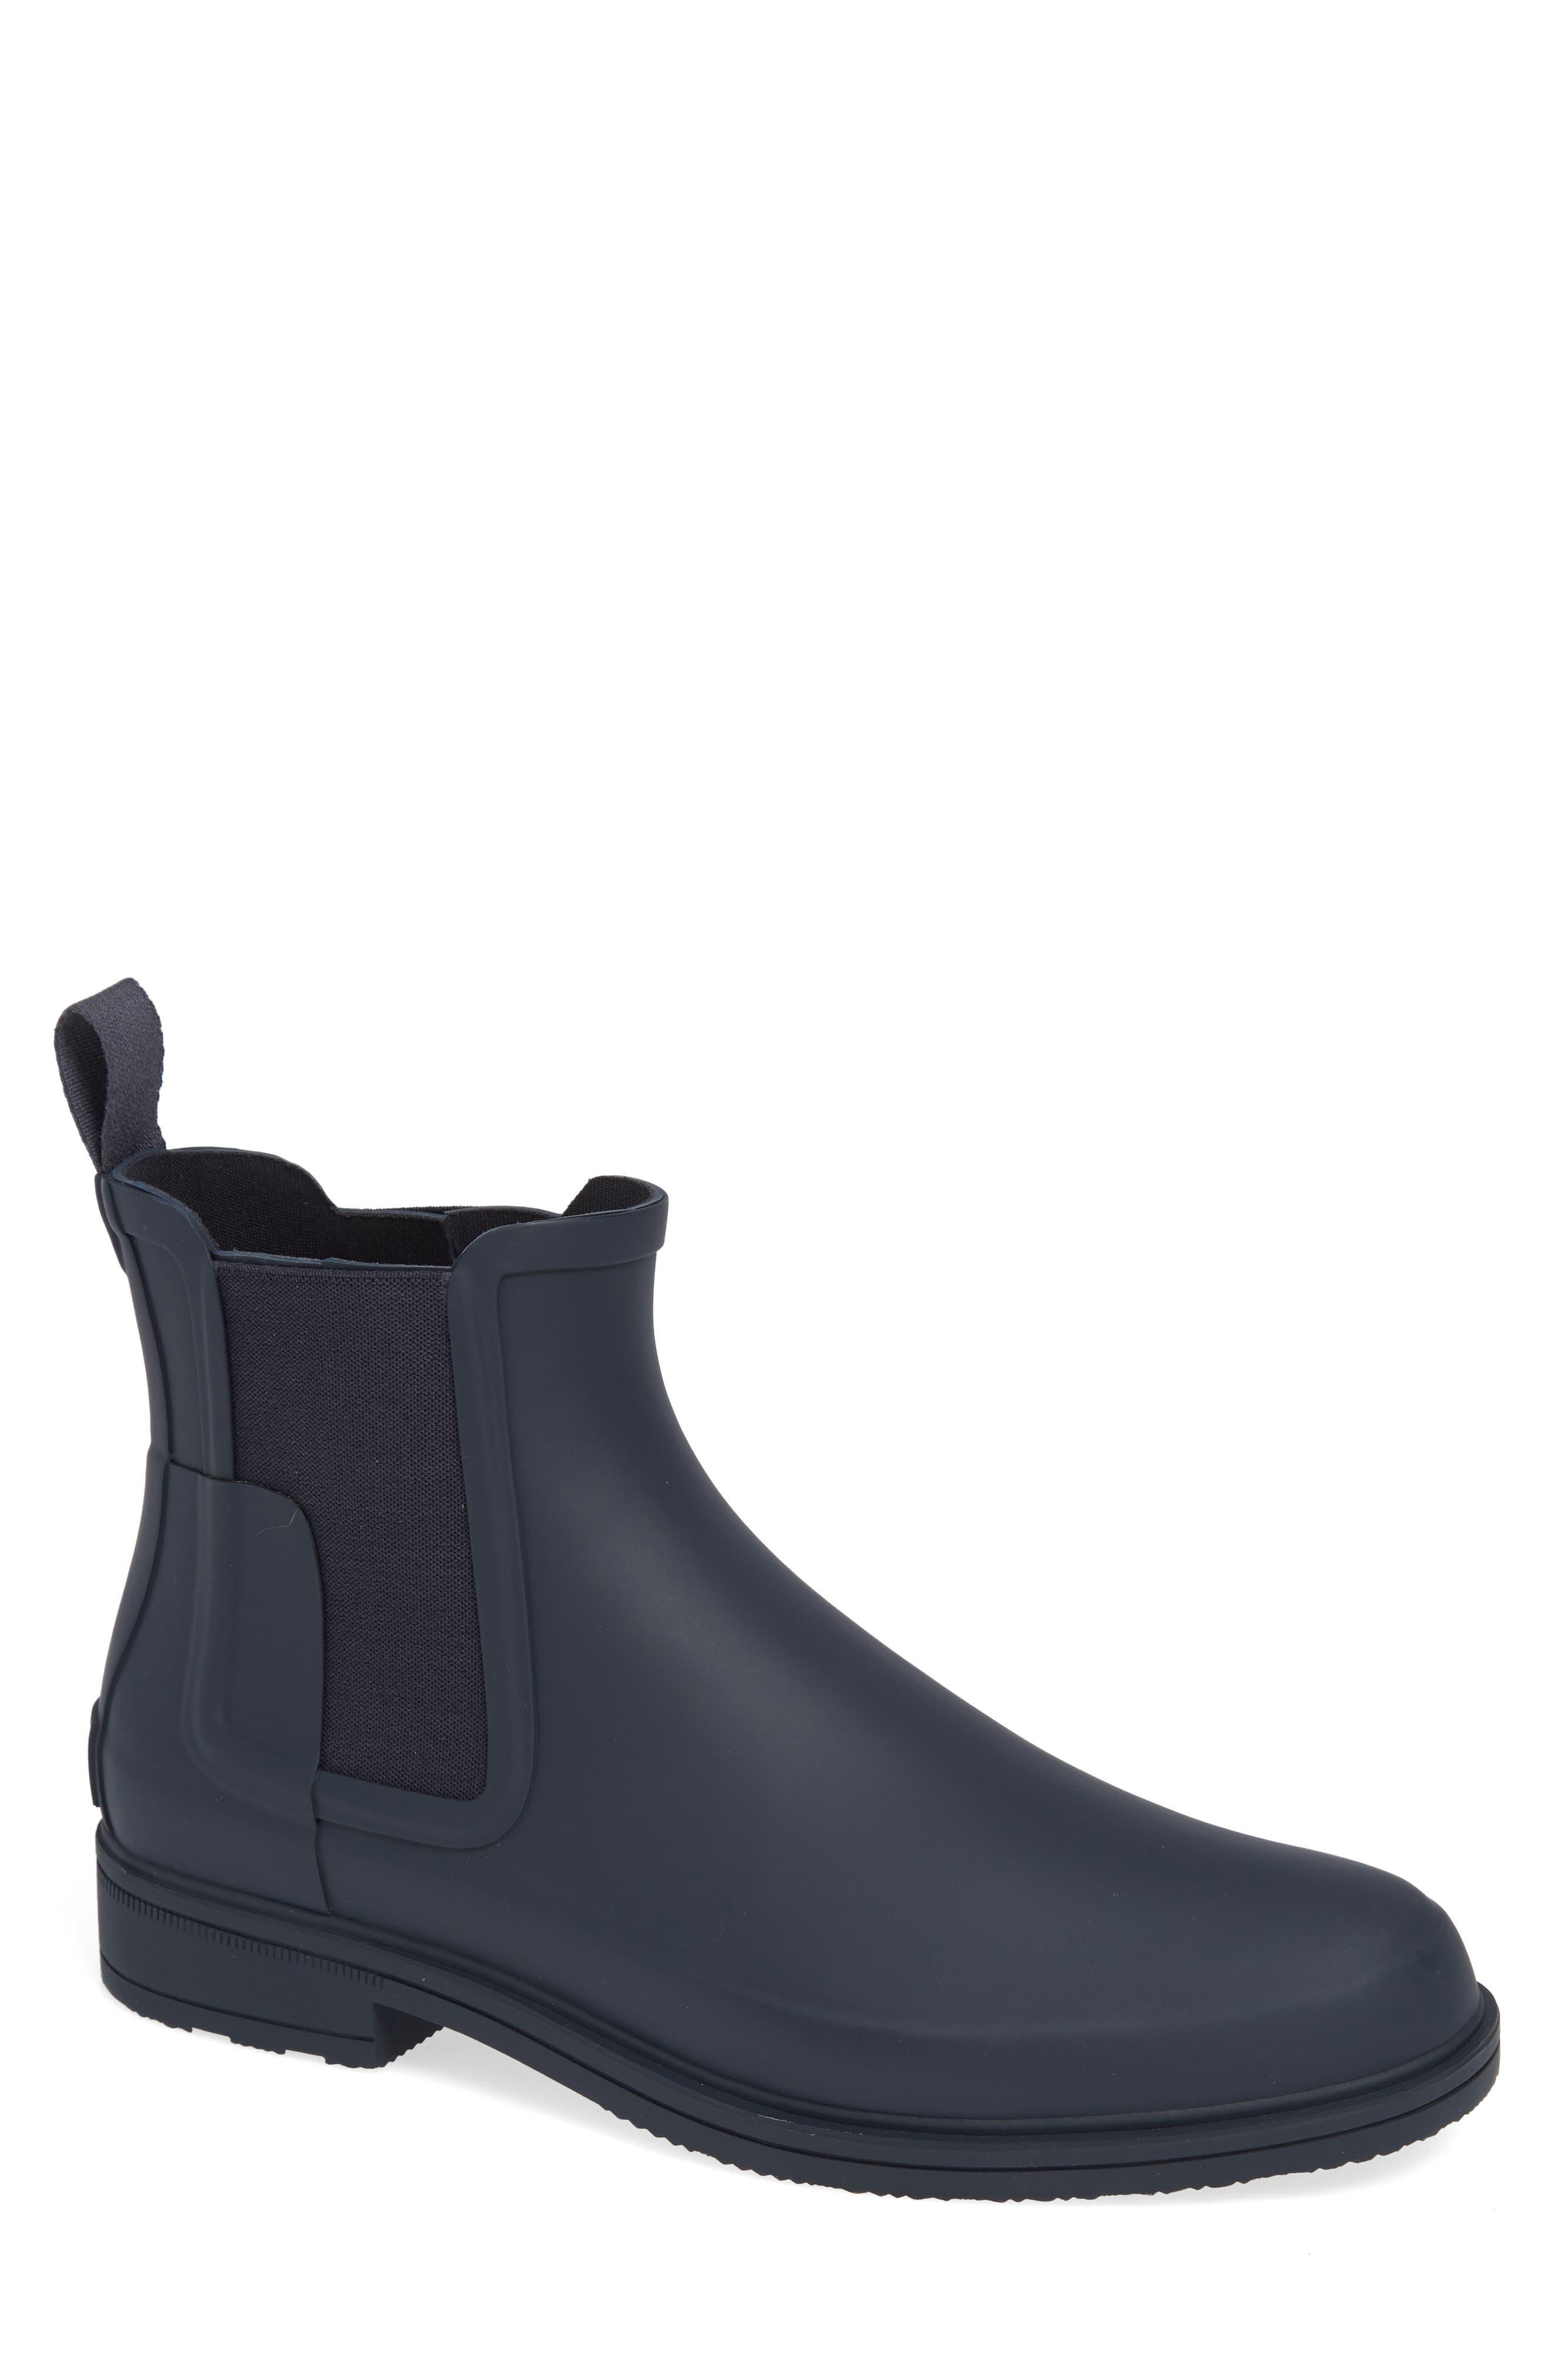 HUNTER Original Refined Waterproof Chelsea Boot, Main, color, NAVY RUBBER